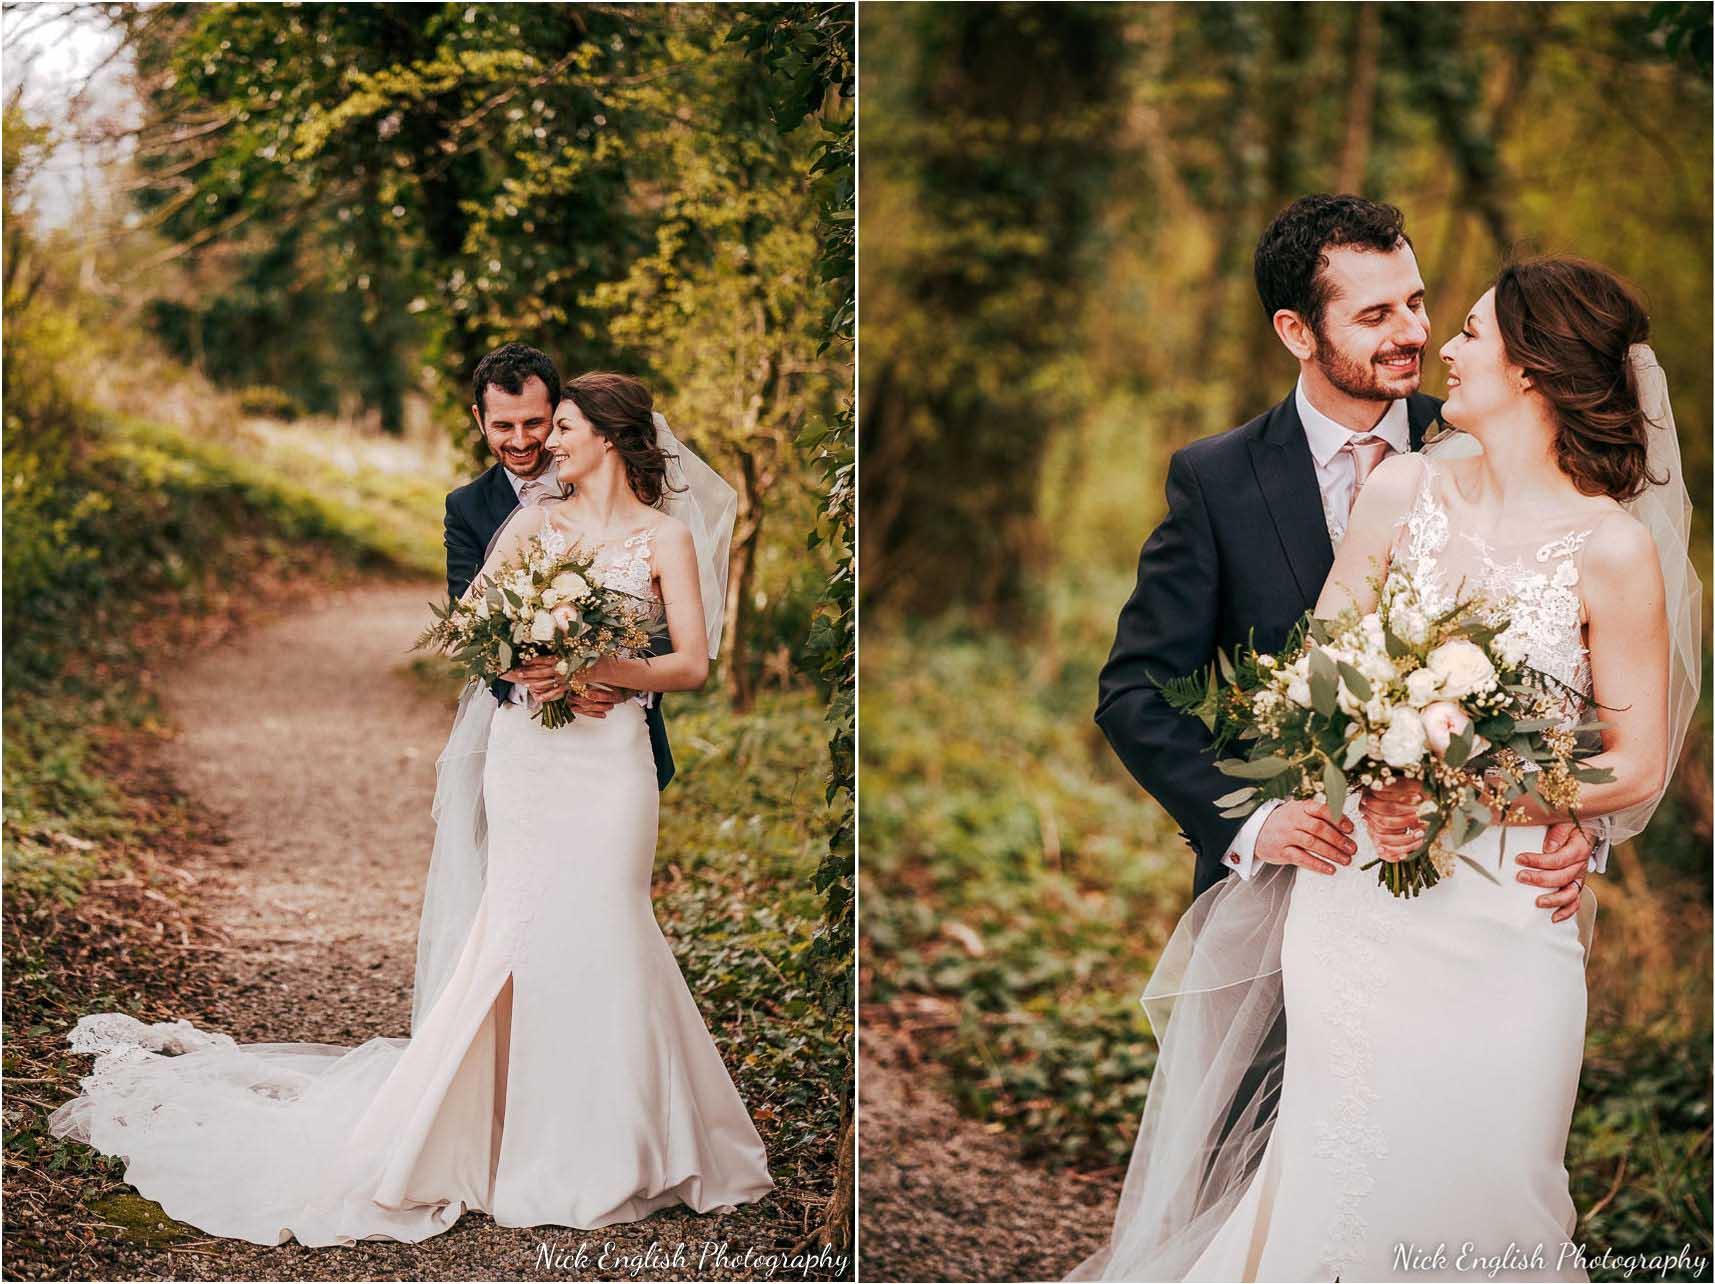 Mitton_Hall_Wedding_Photographer-88 copy.jpg